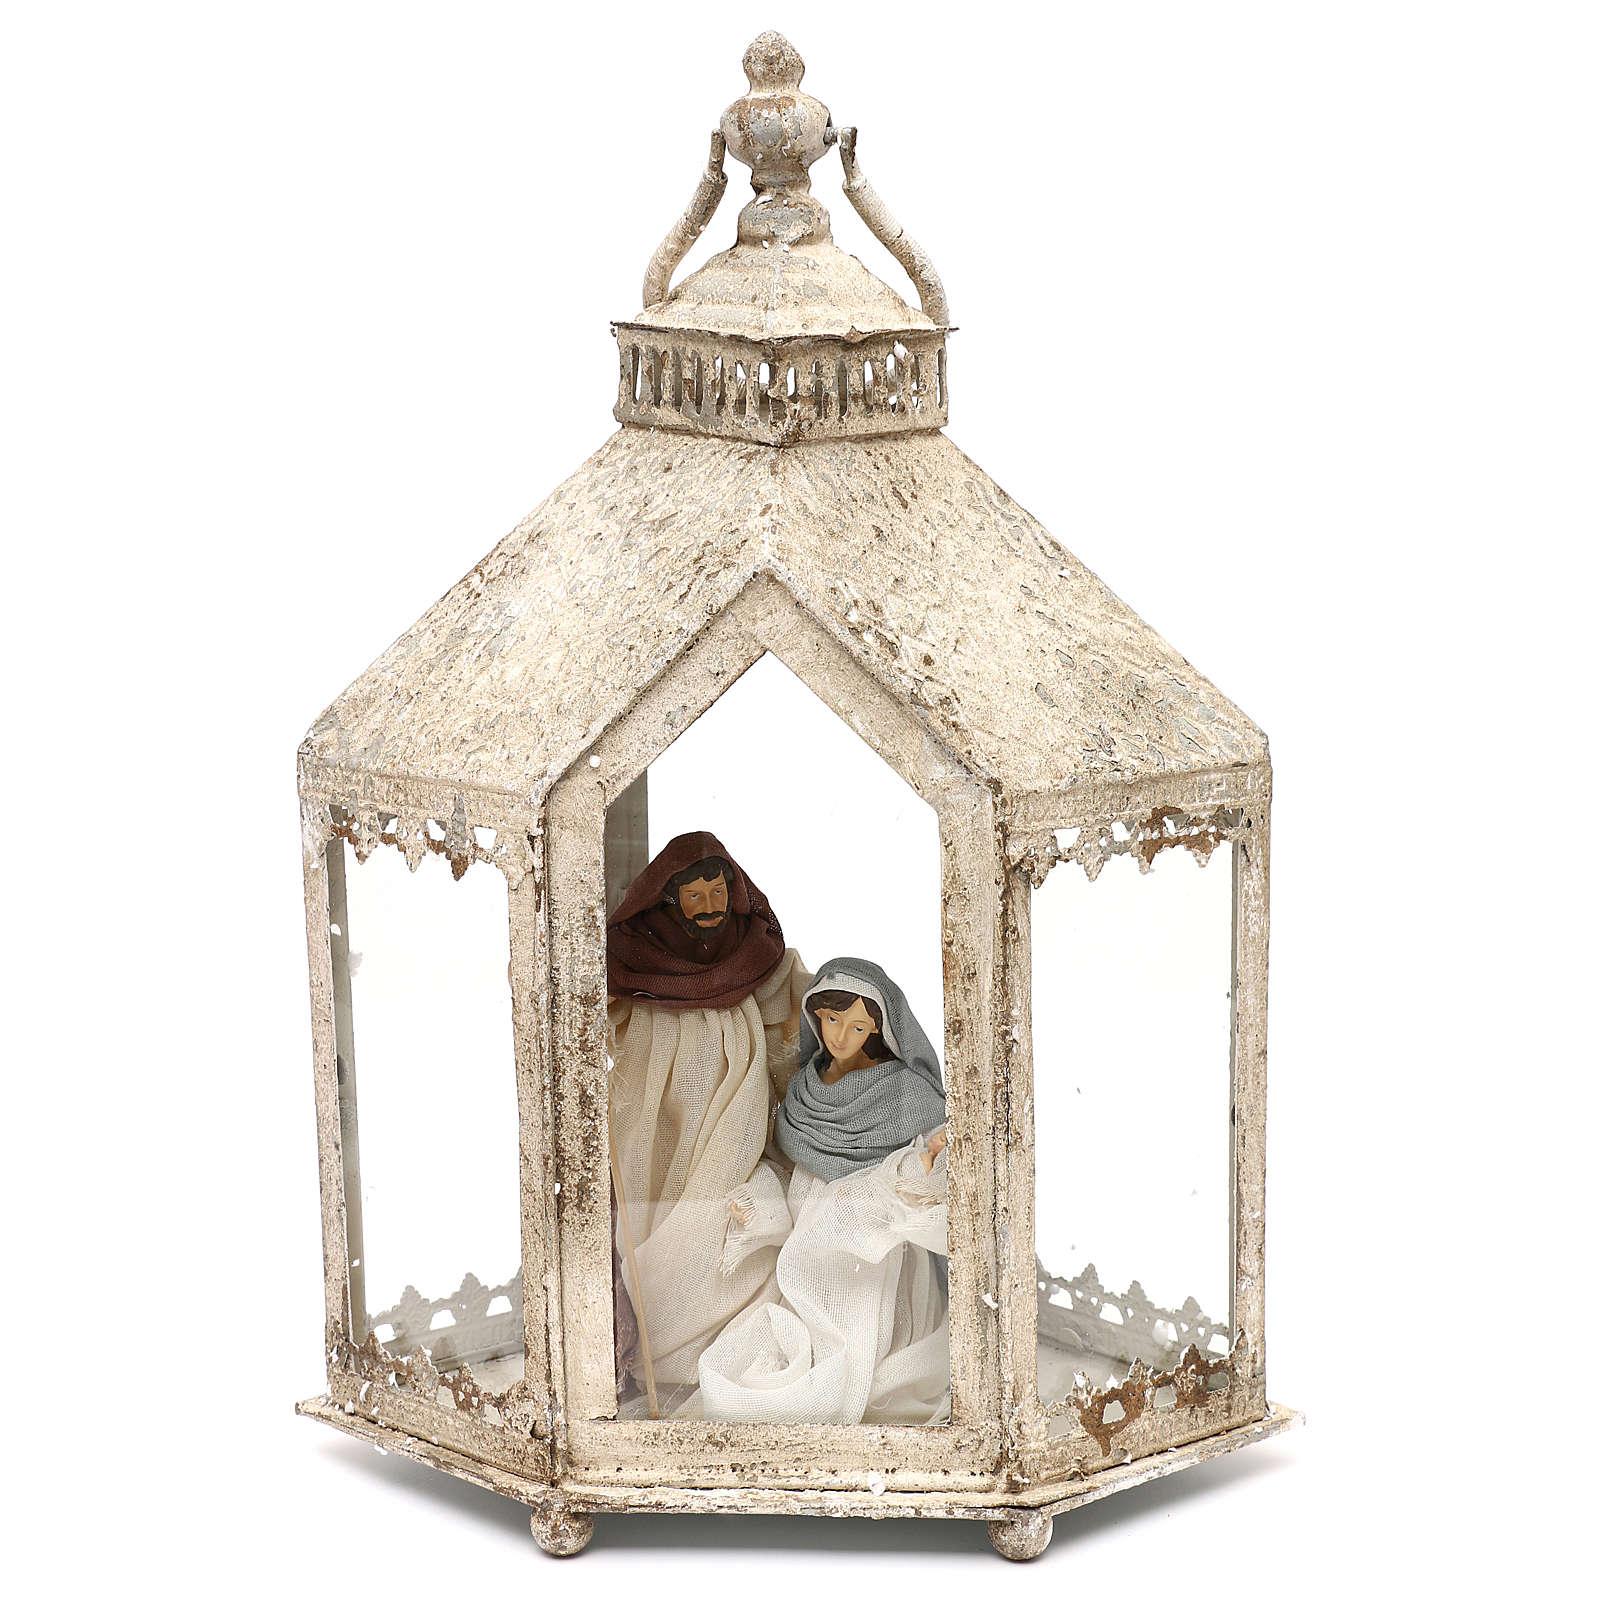 Sacra famiglia 20 cm in lanterna esagonale 45x35x15 cm 3